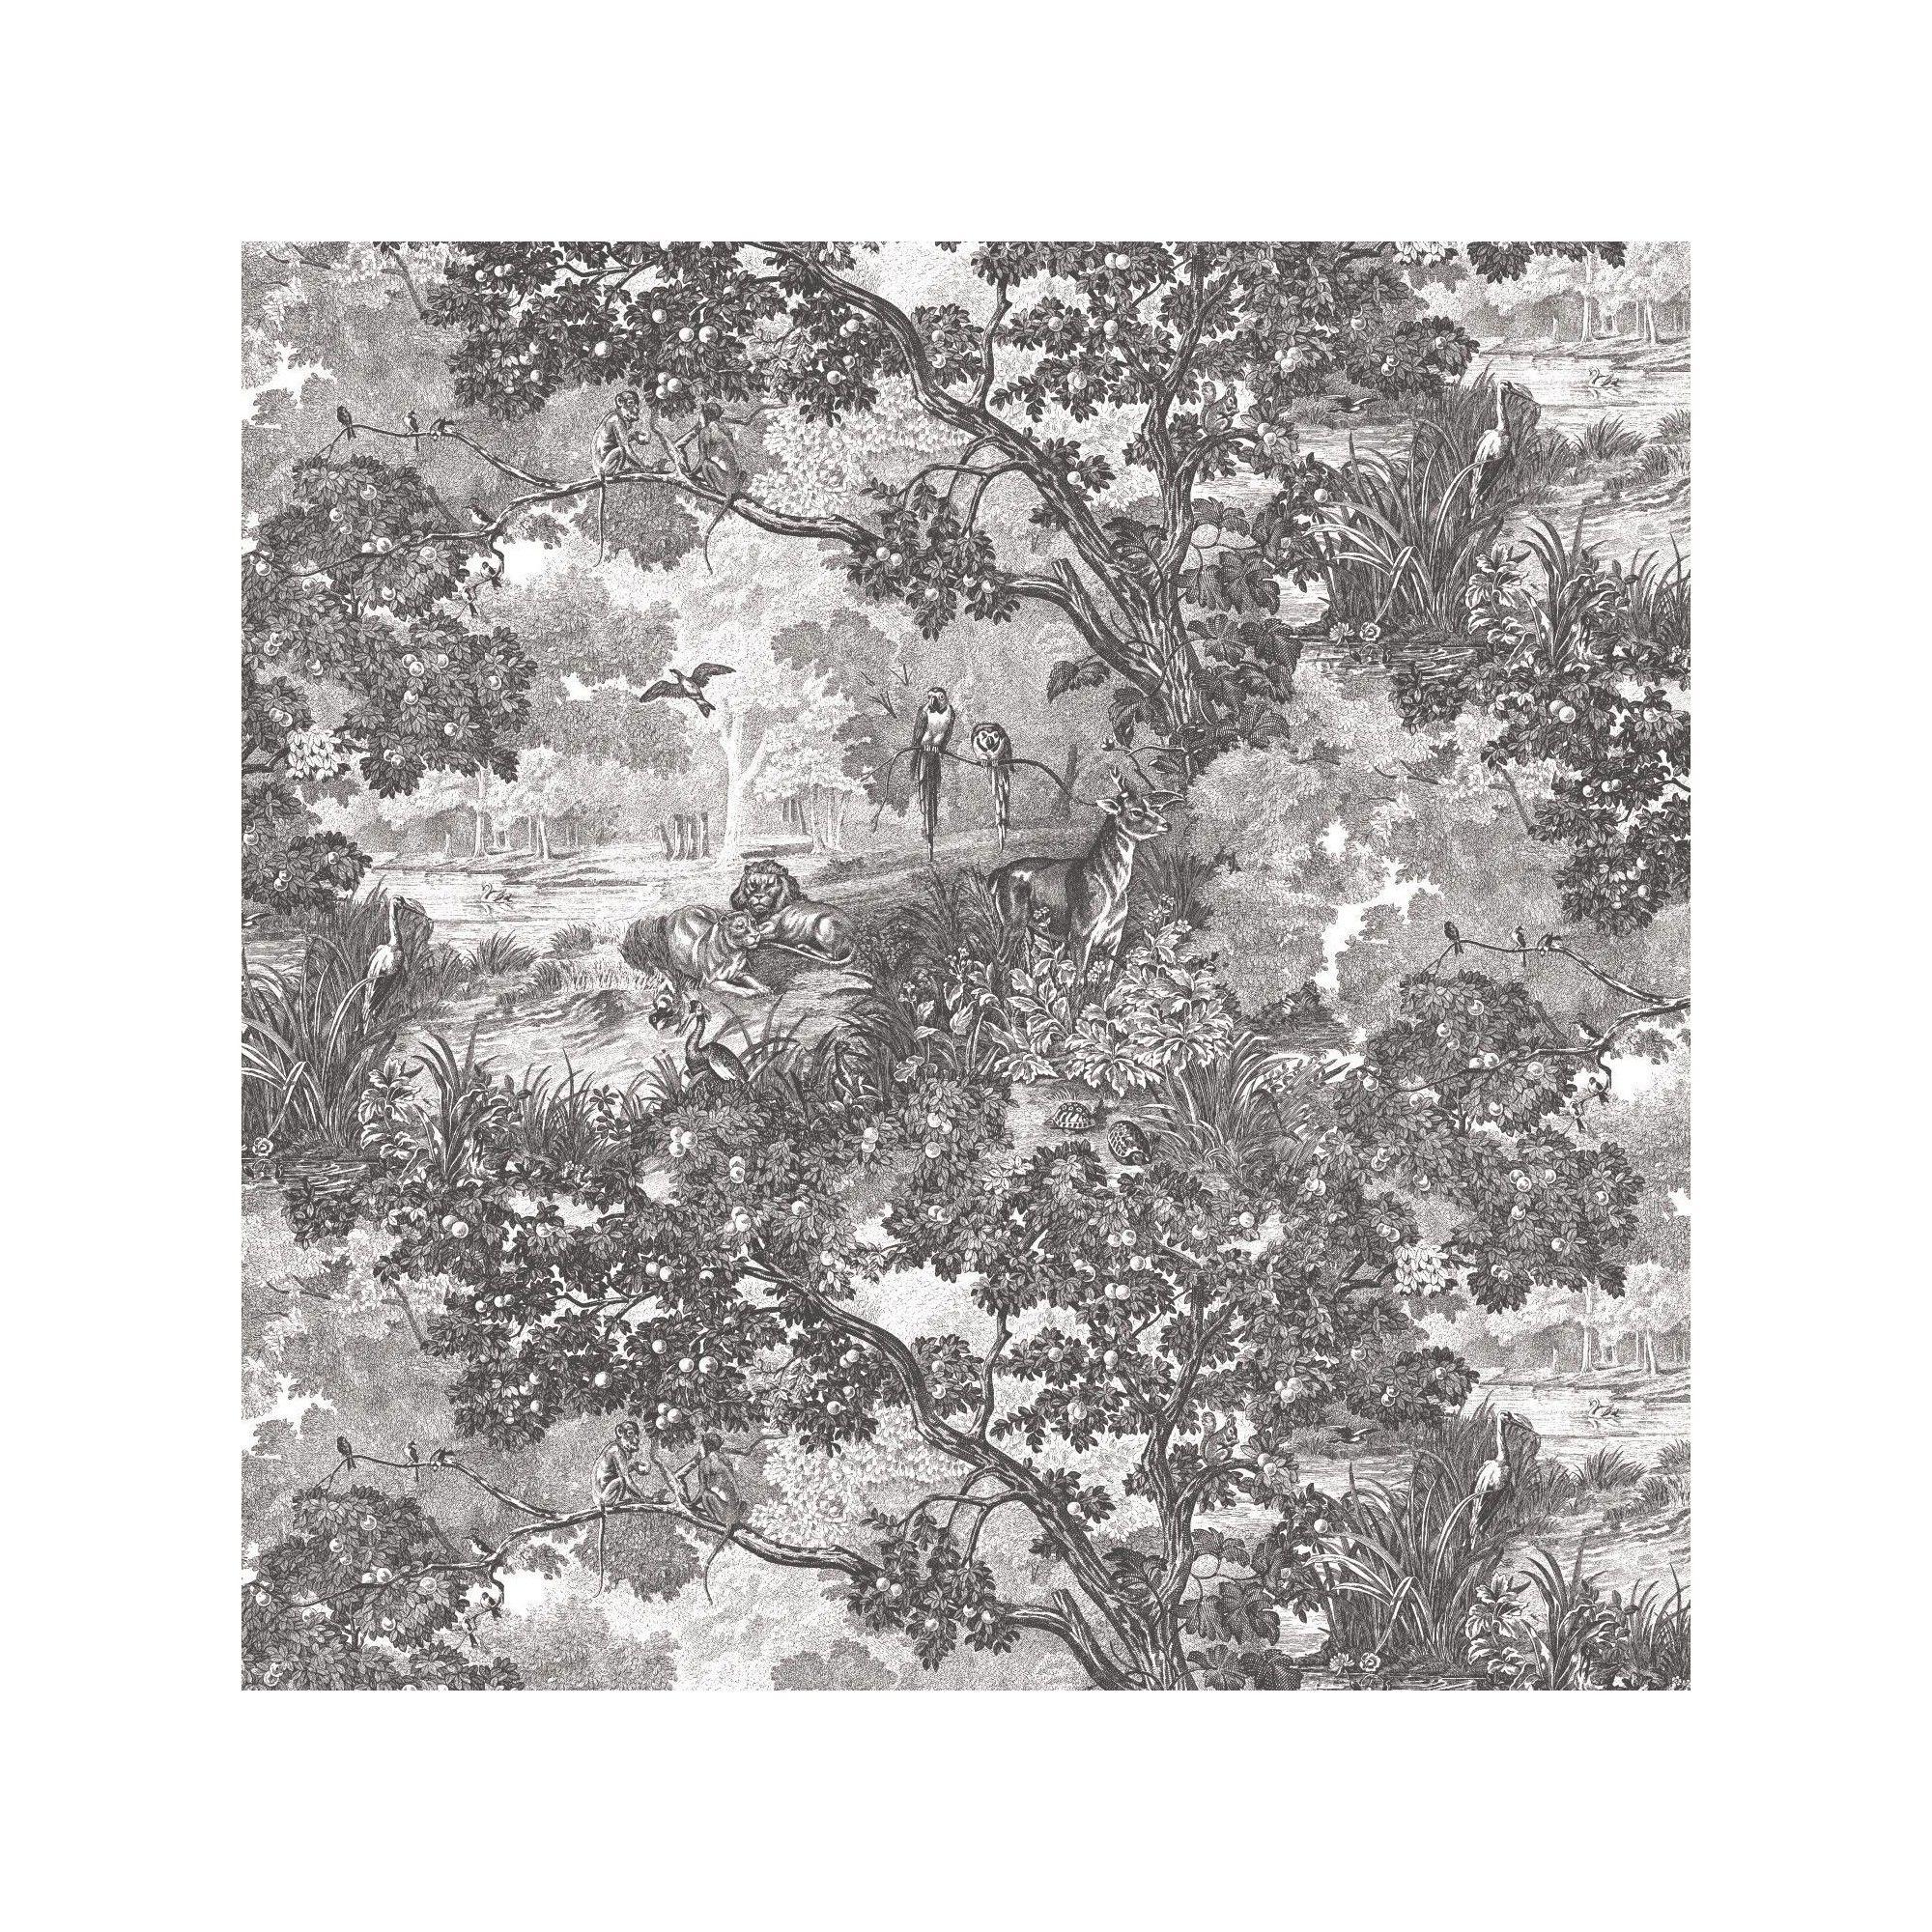 Roommates Jungle Toile Peel Stick Wallpaper Black White Peel And Stick Wallpaper Toile Wallpaper Wallpaper